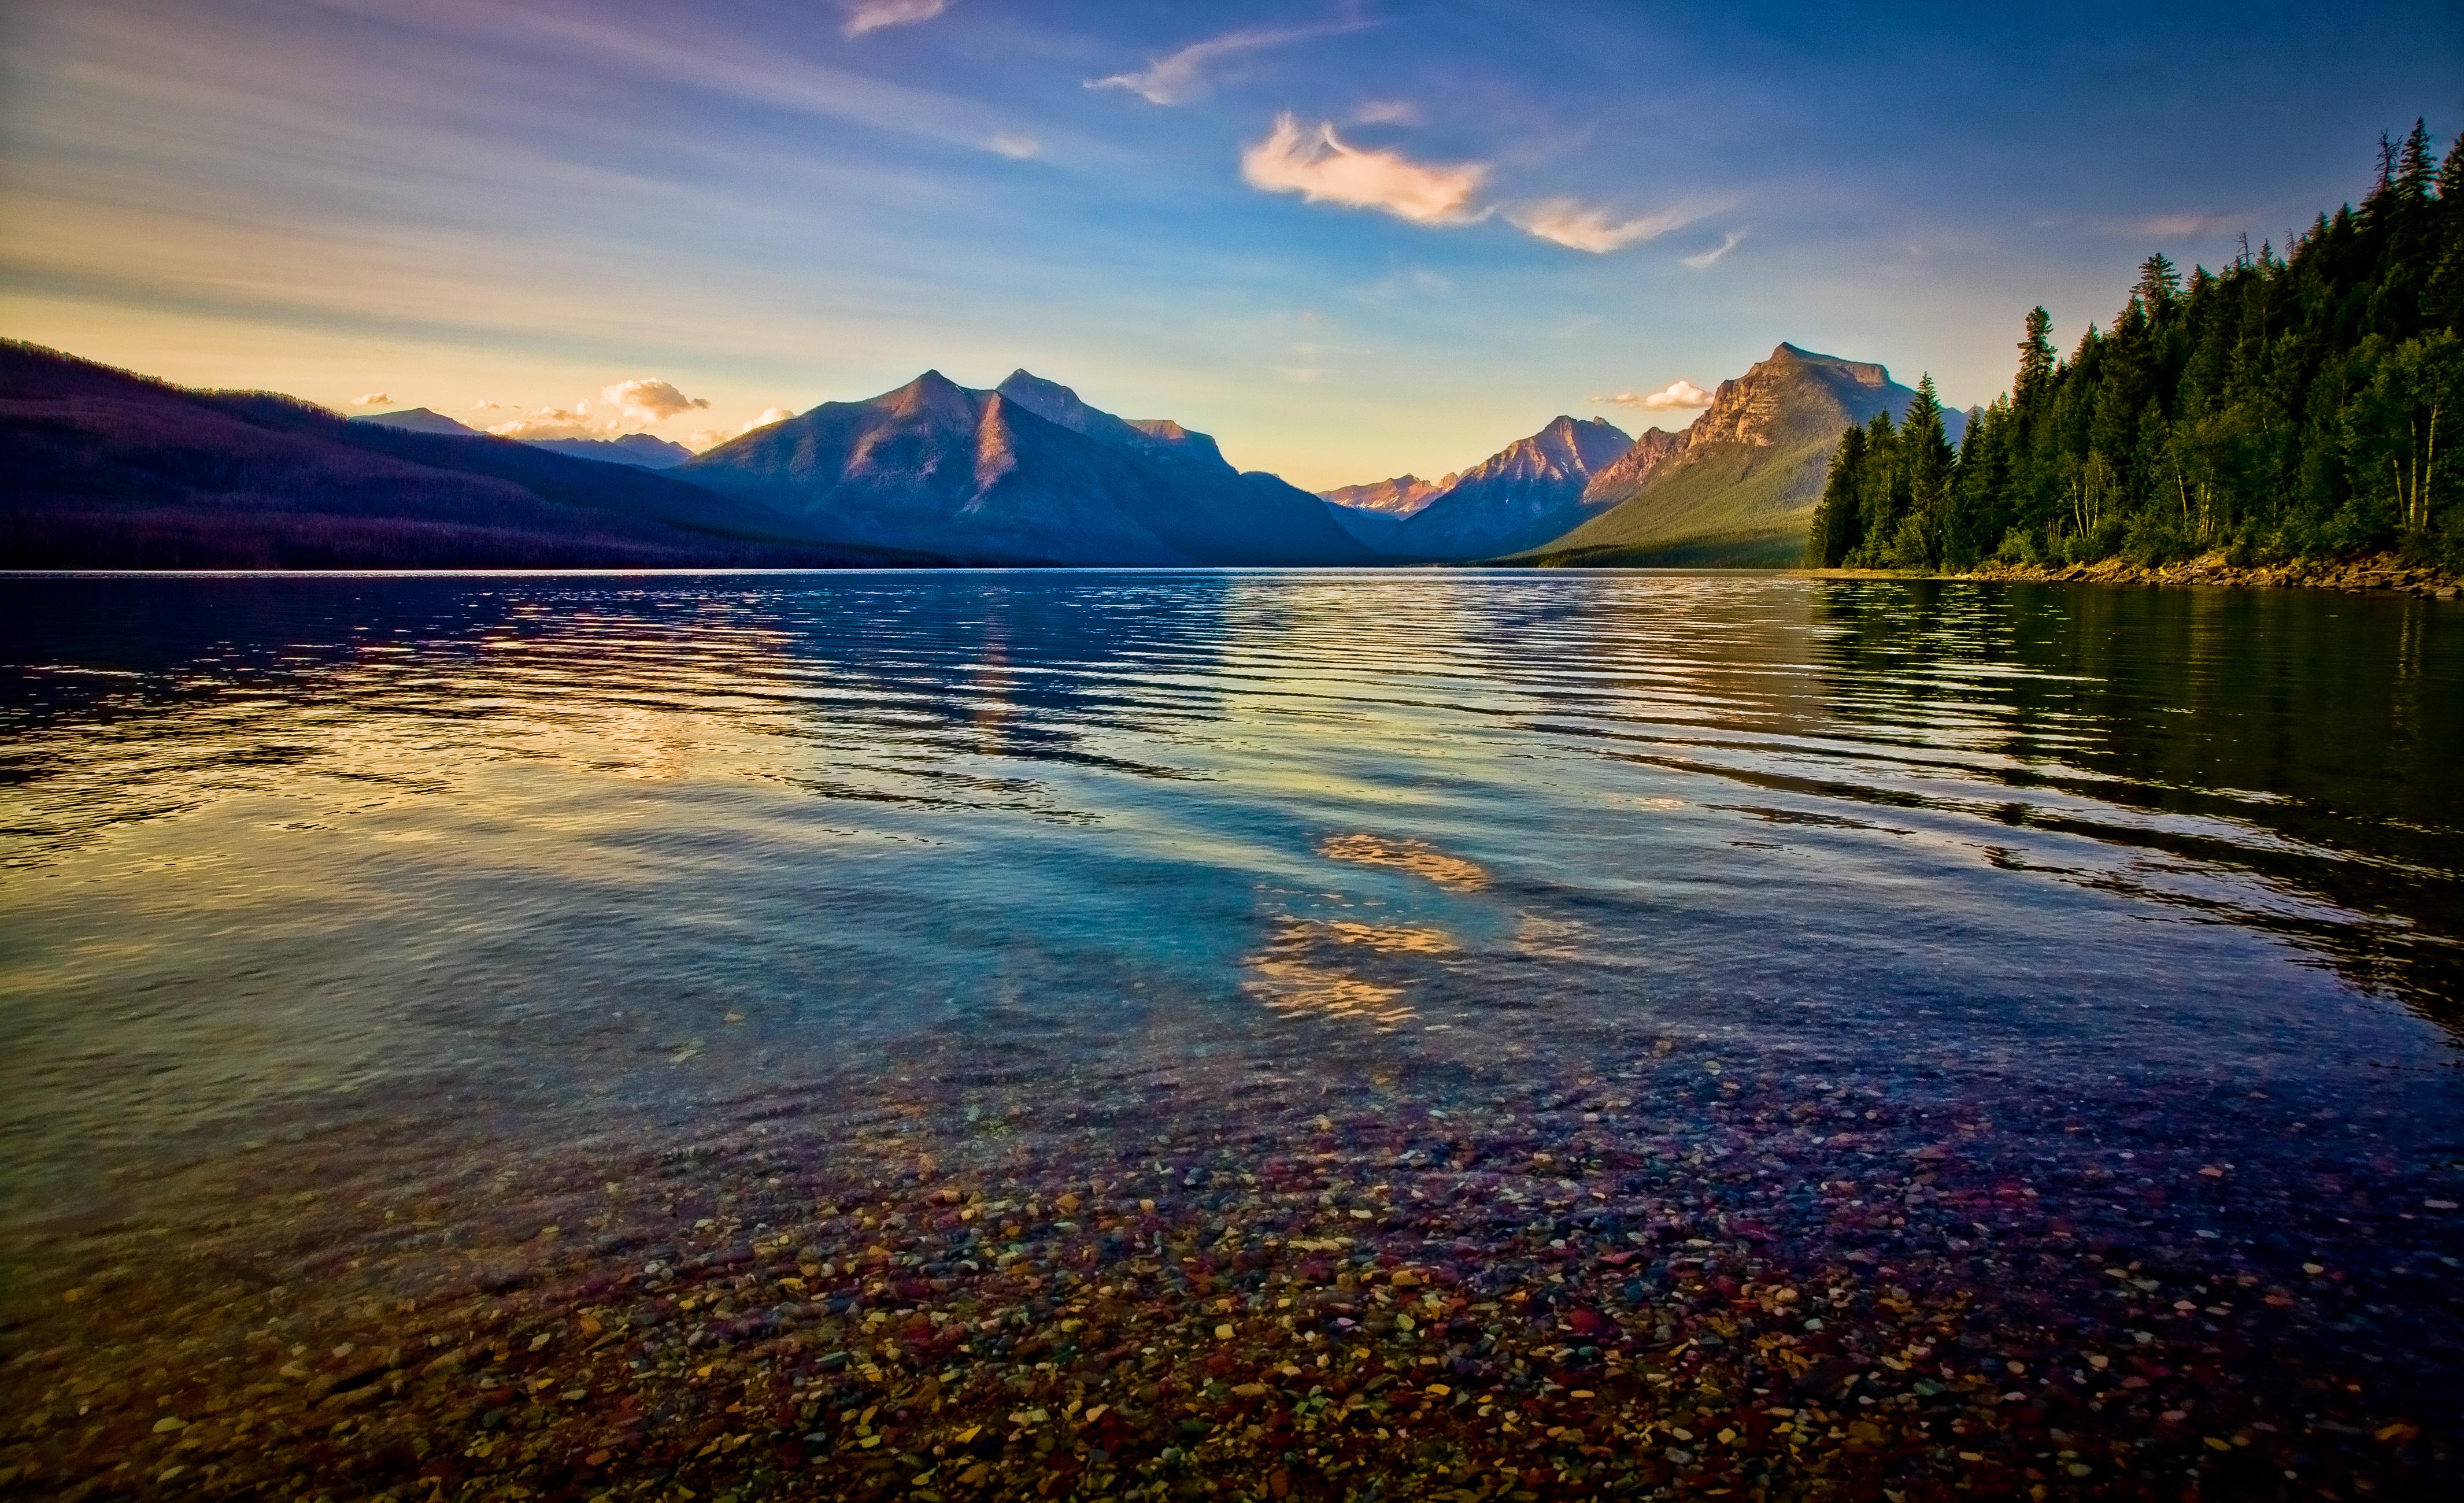 Images of Lake McDonald | 4262x2600